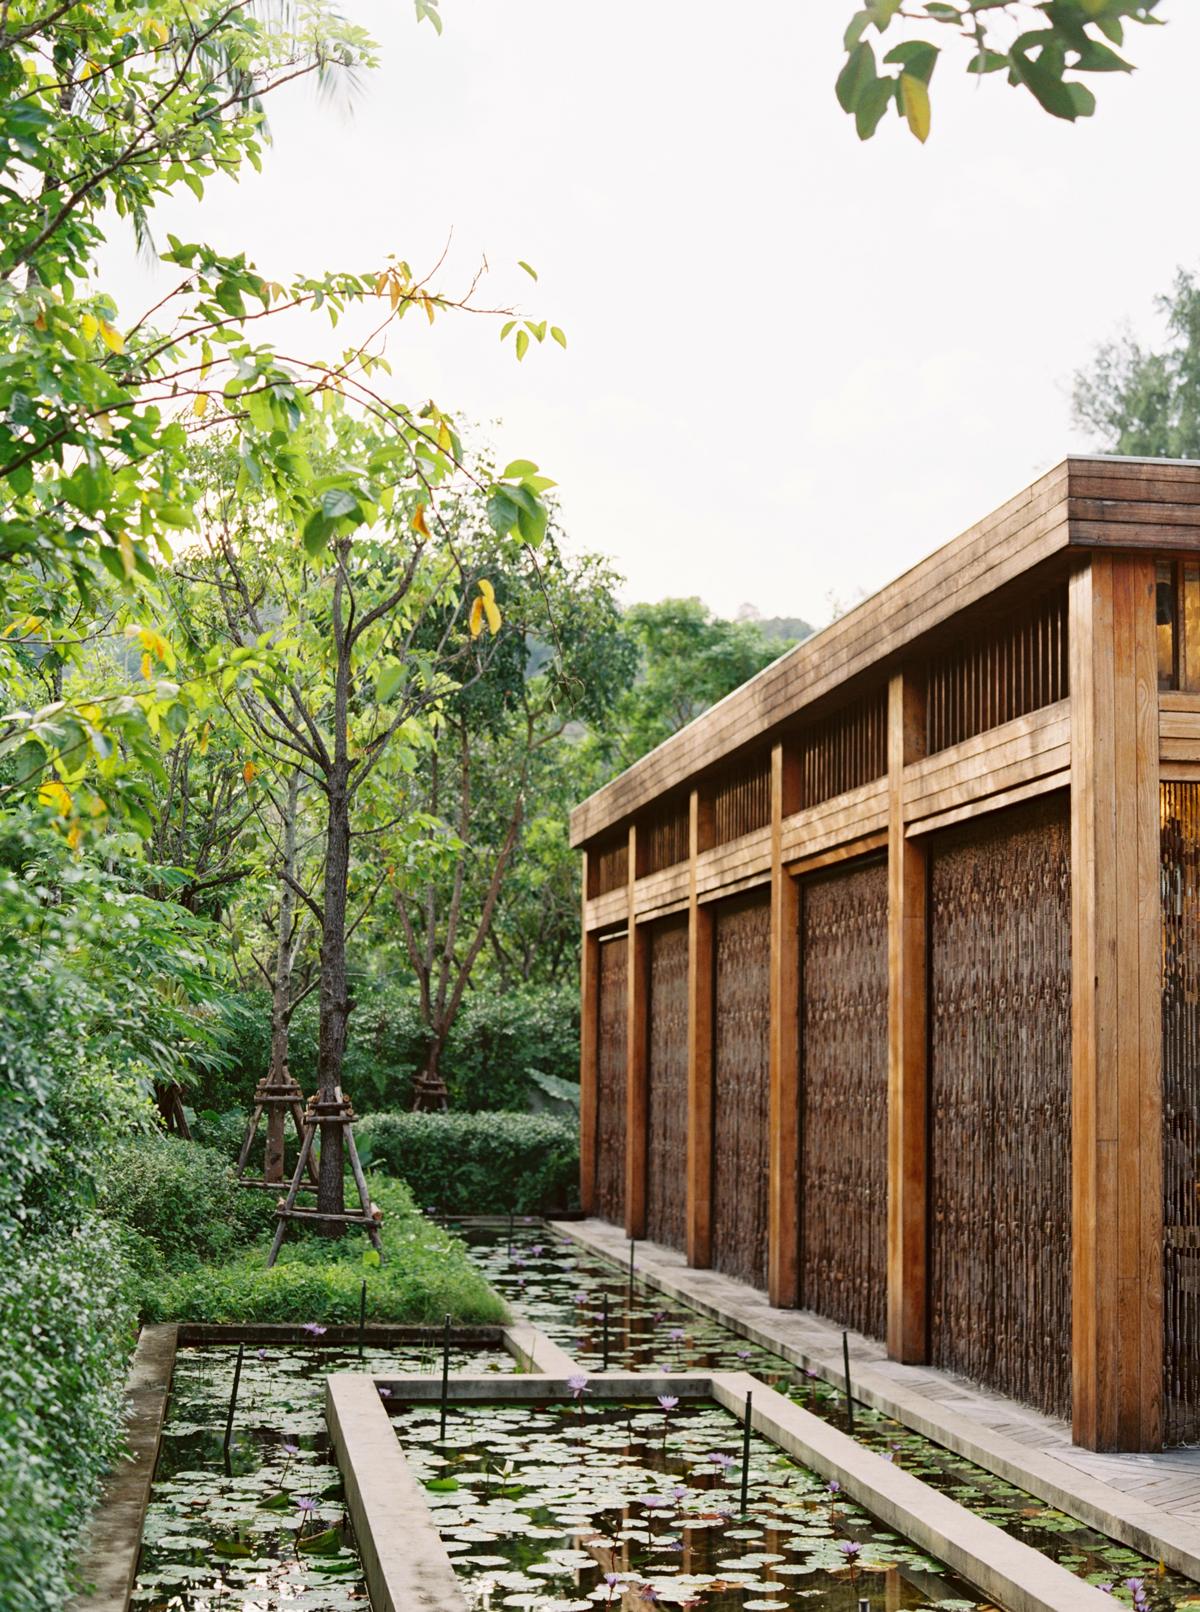 jada-jeffrey-wedding-venue-0619.jpg